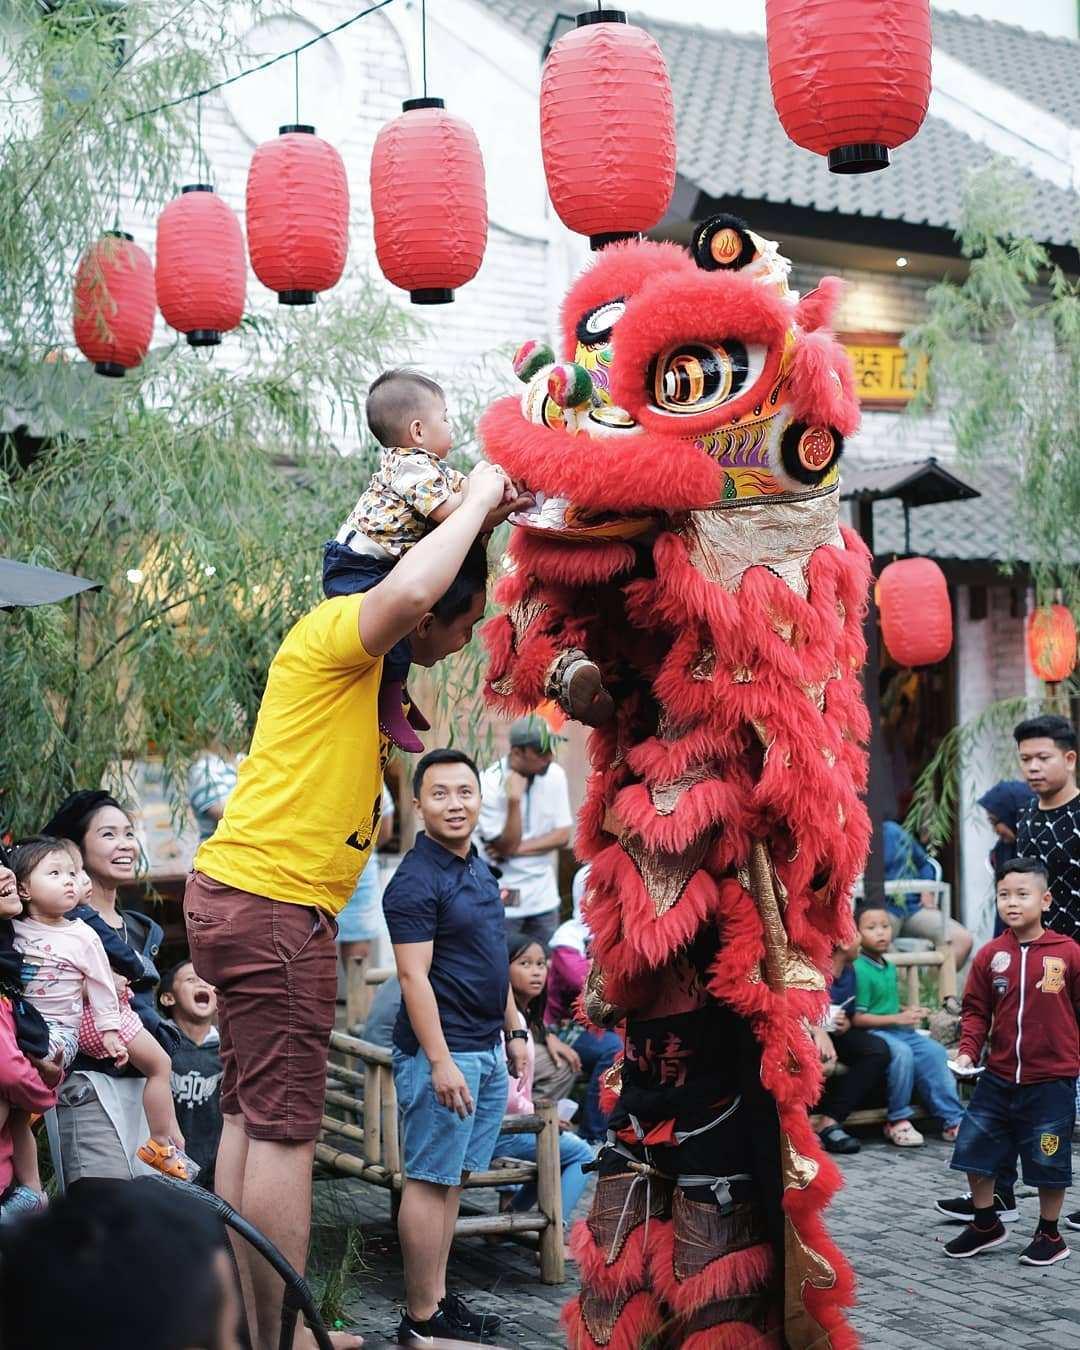 Pertunjukan Barongsai di Chinatown Bandung, Image From @chinatownbandung